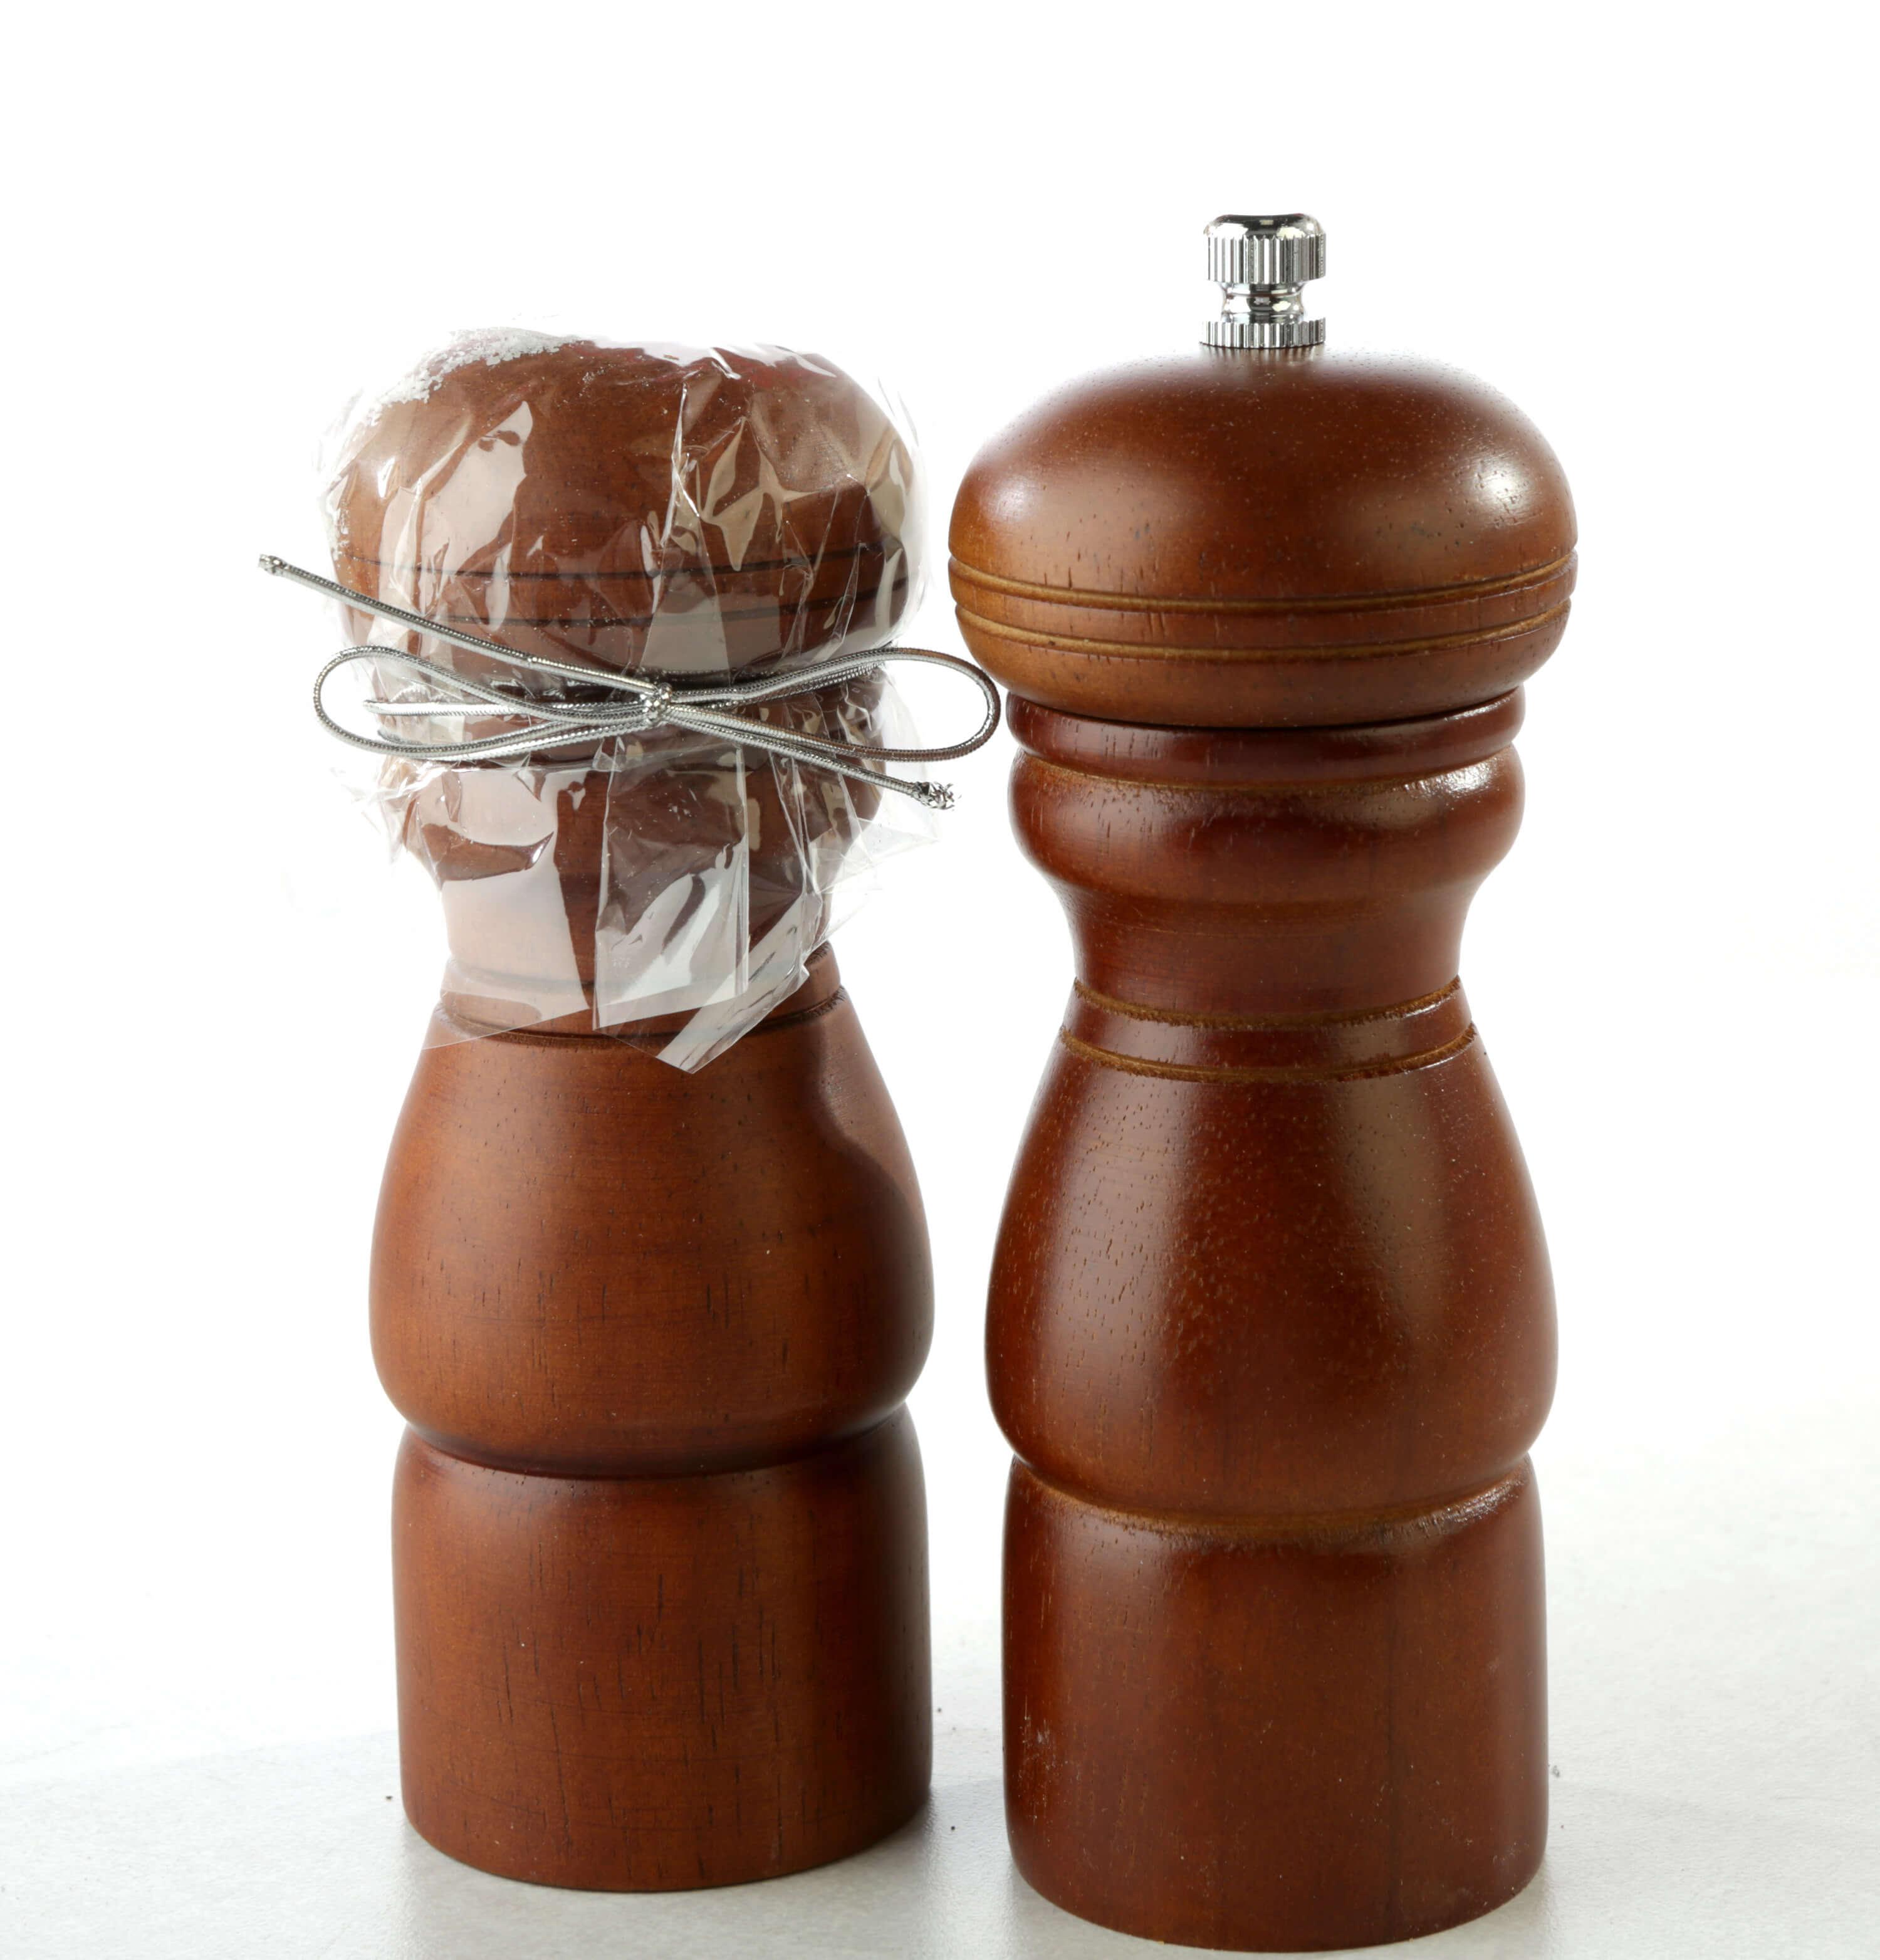 Dark wood peppermill and salt shaker set